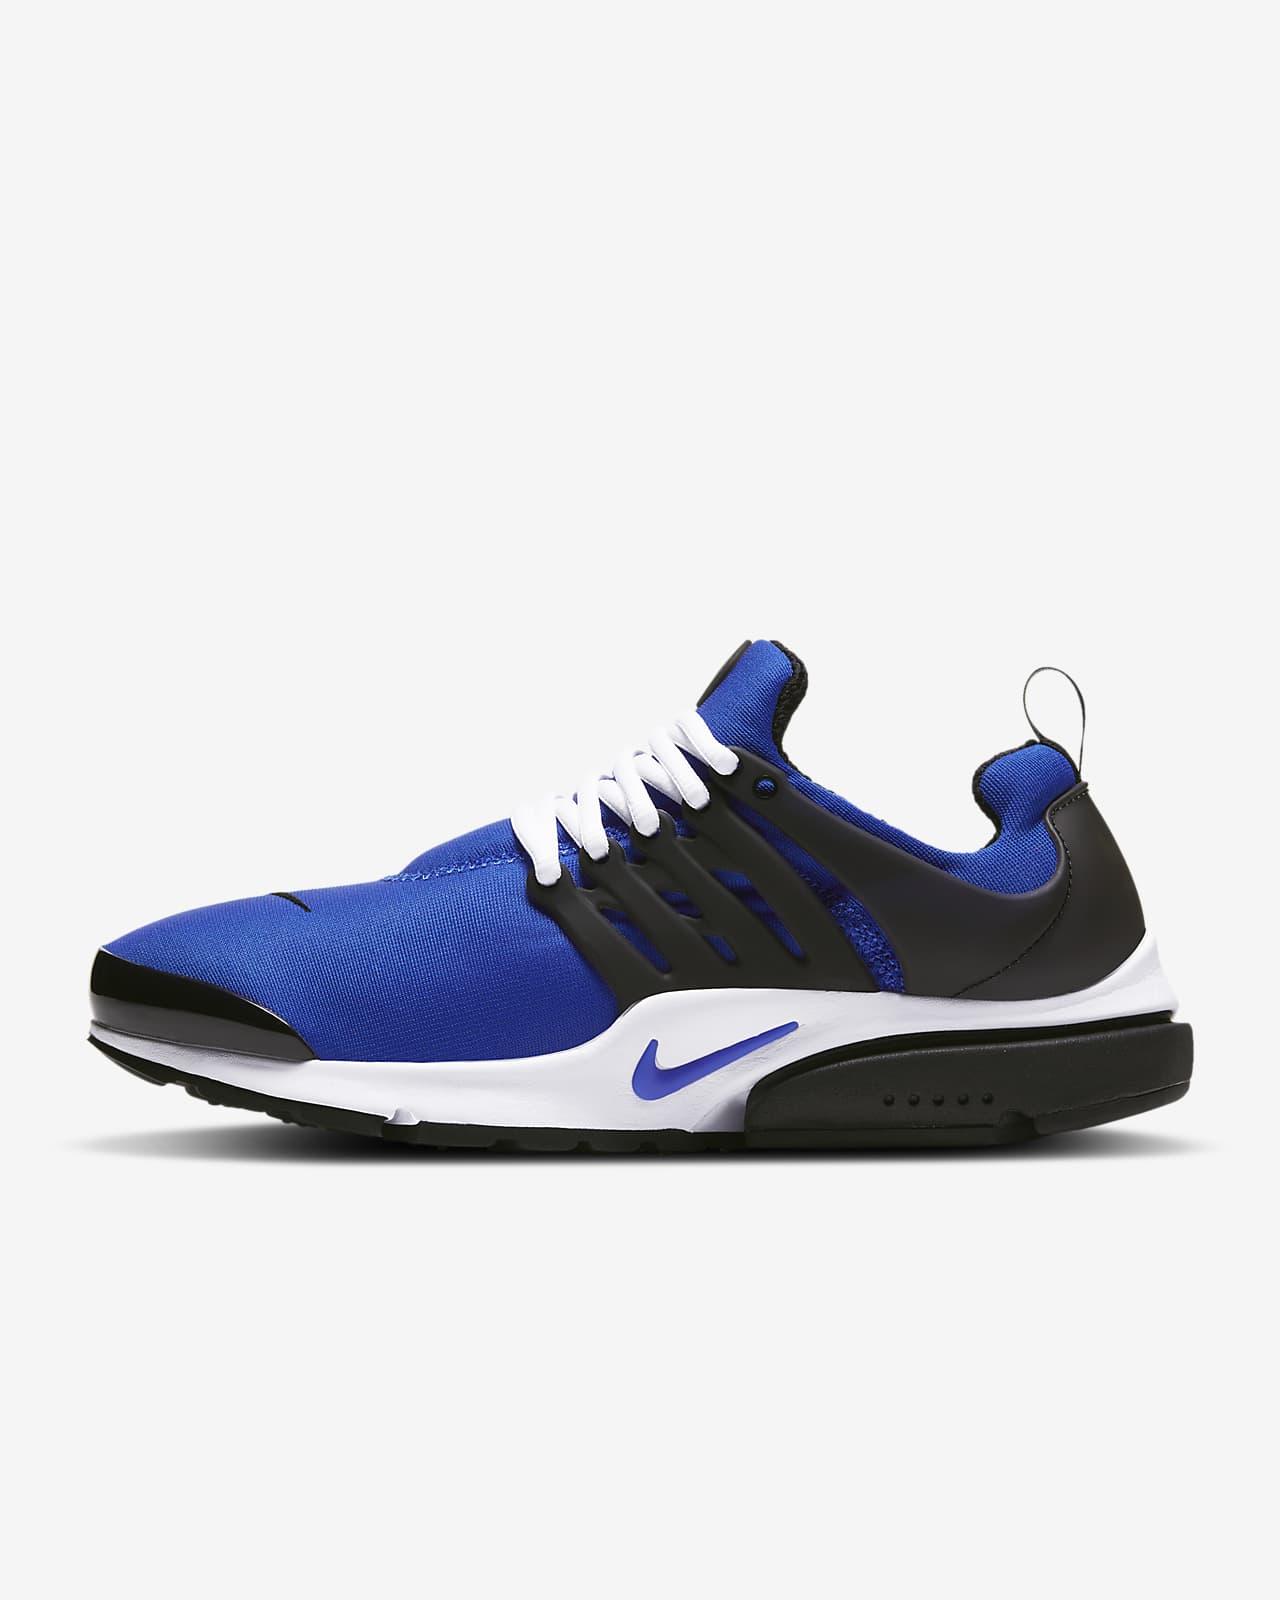 Nike Air Presto Herrenschuh